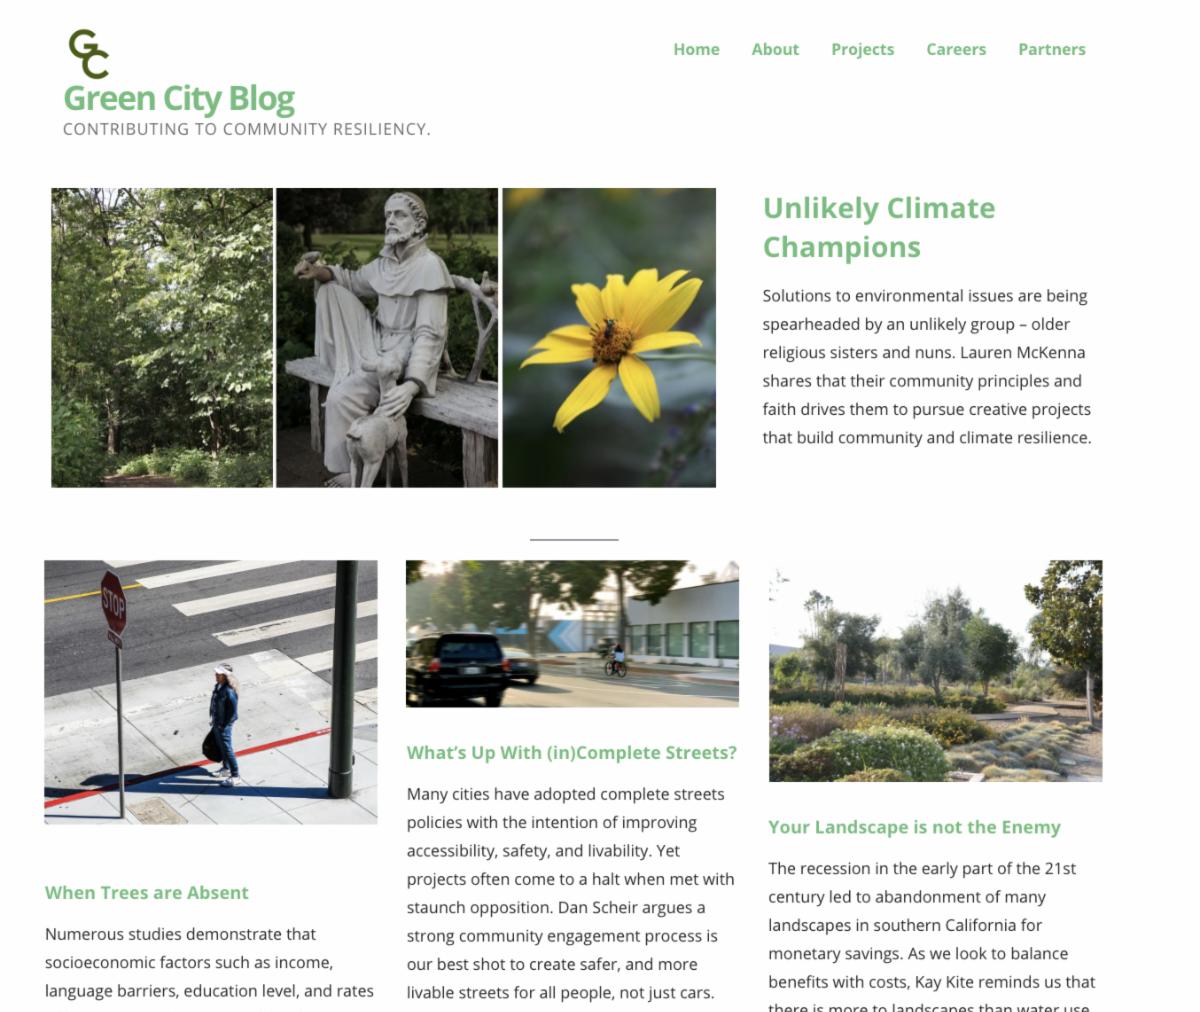 mla green city blog